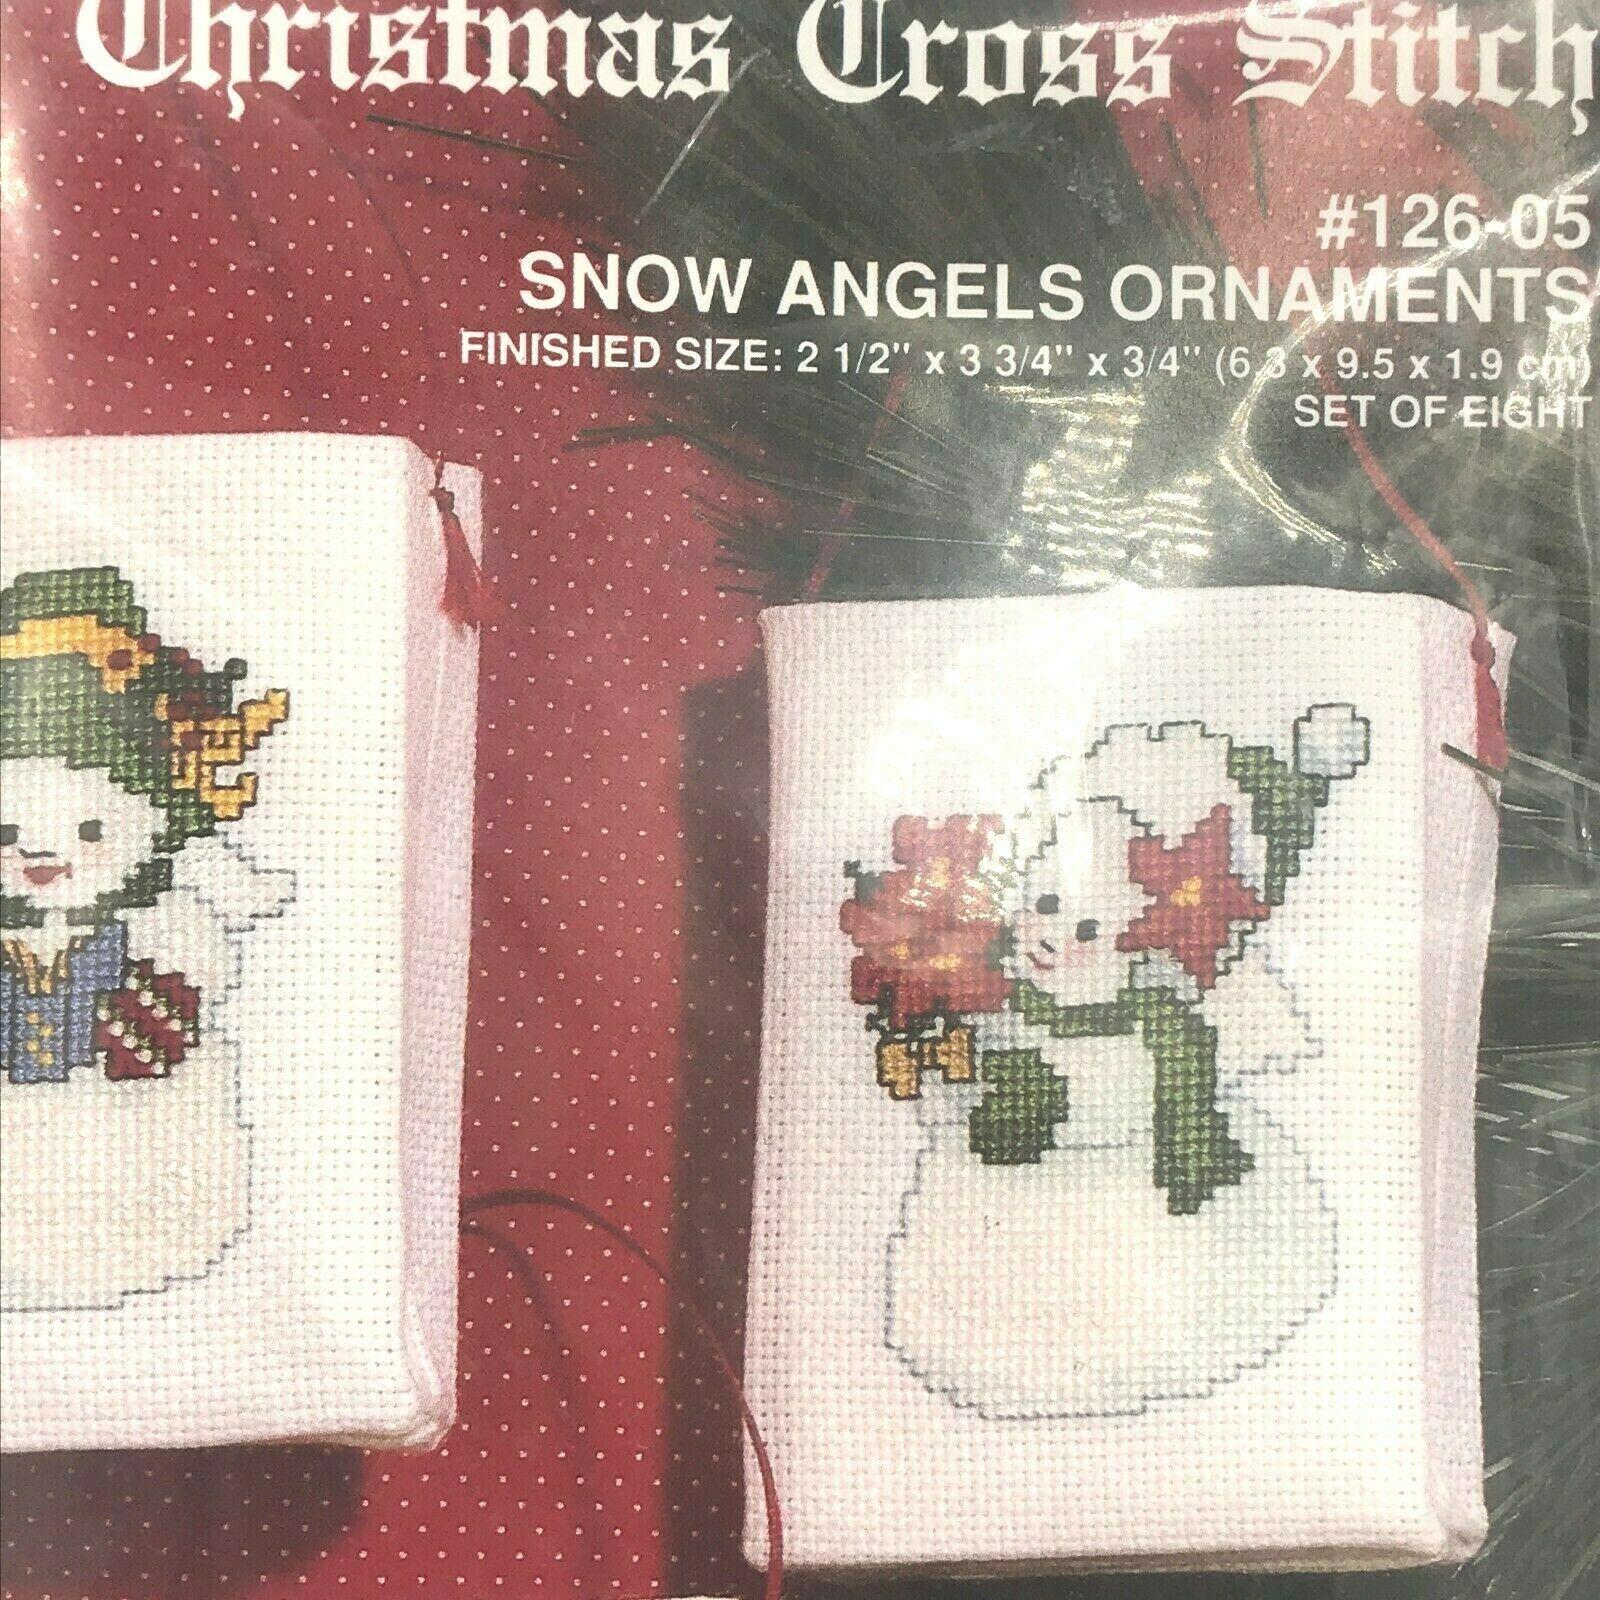 Janlynn Christmas Cross Stitch Snow Angels Set 8 Ornaments Kit 126-05 New AR